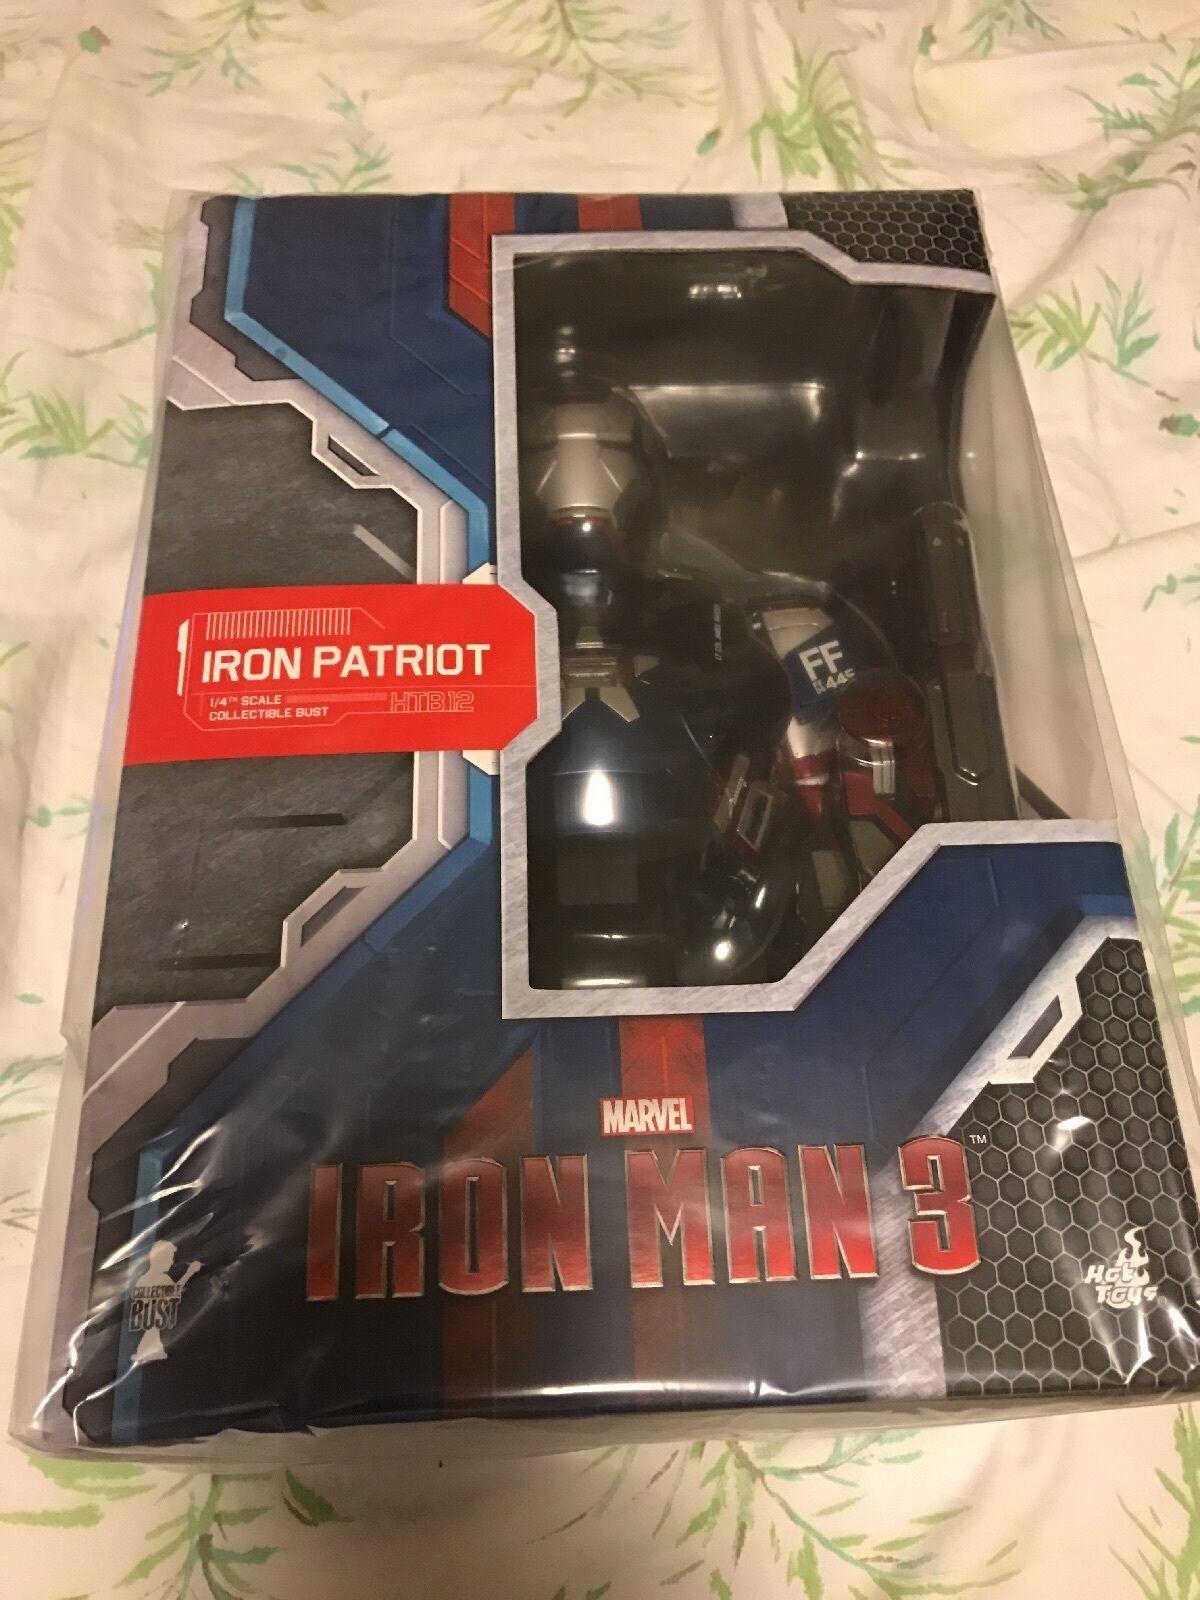 Hot Juguetes Iron Man 3 Iron Patriot 1 4 Busto totalmente nuevo vendedor de Estados Unidos